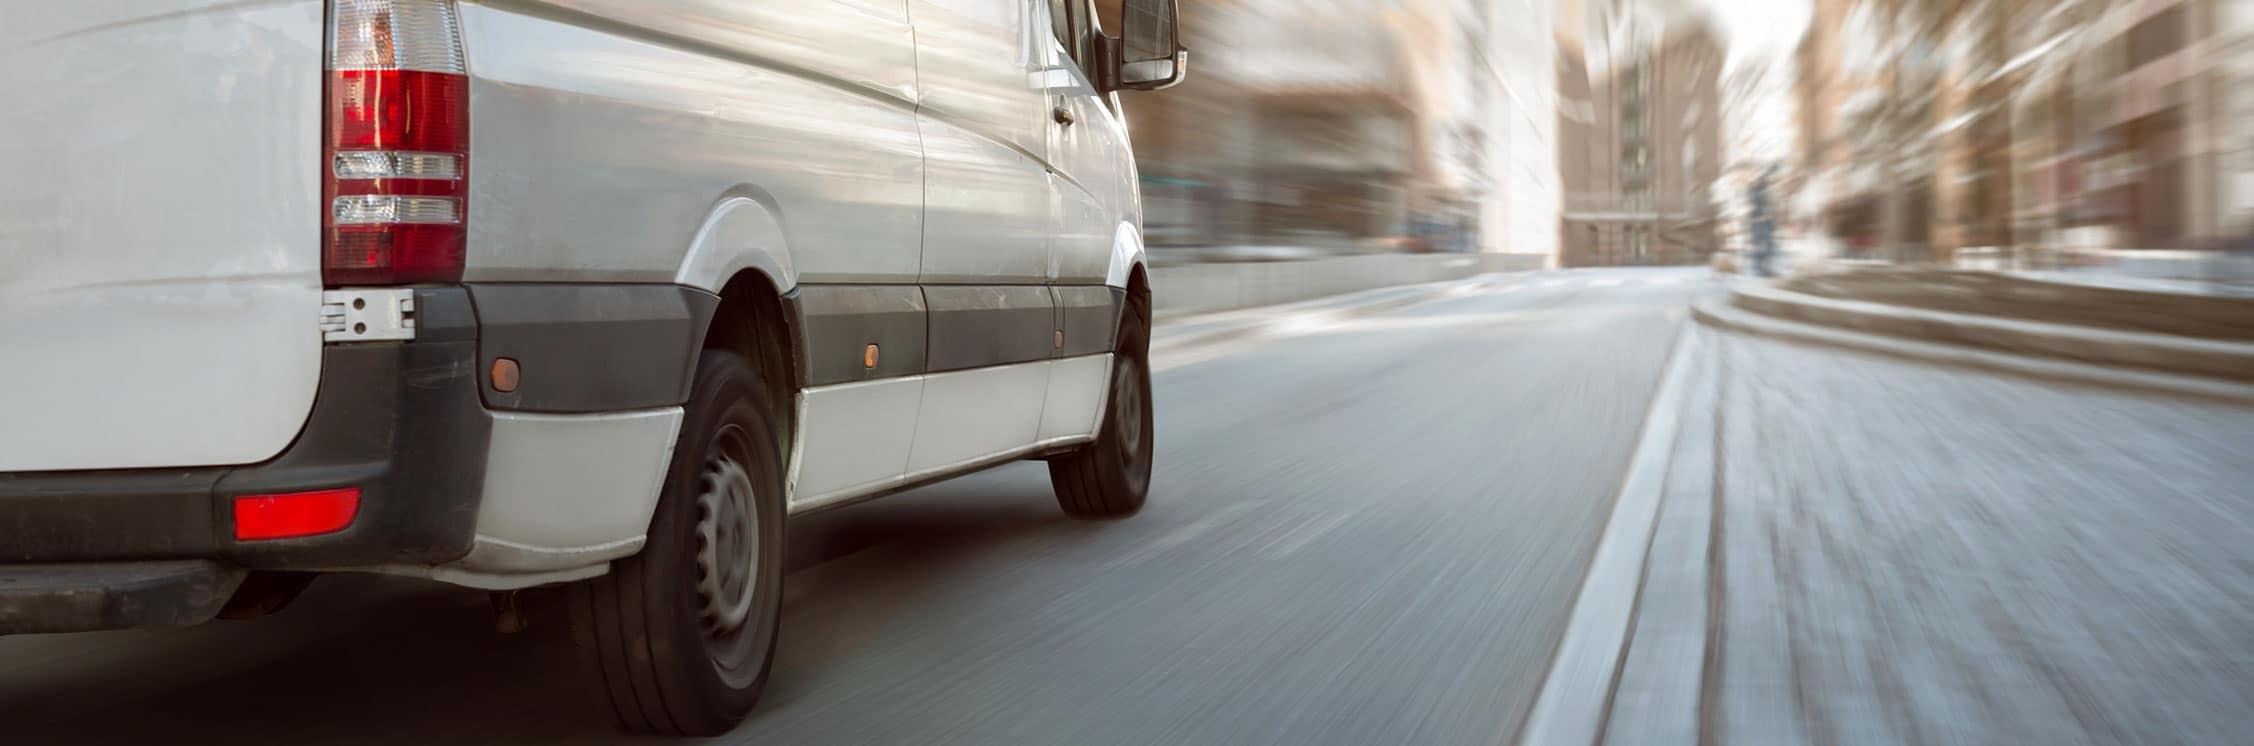 Financement véhicules professionnels Annecy